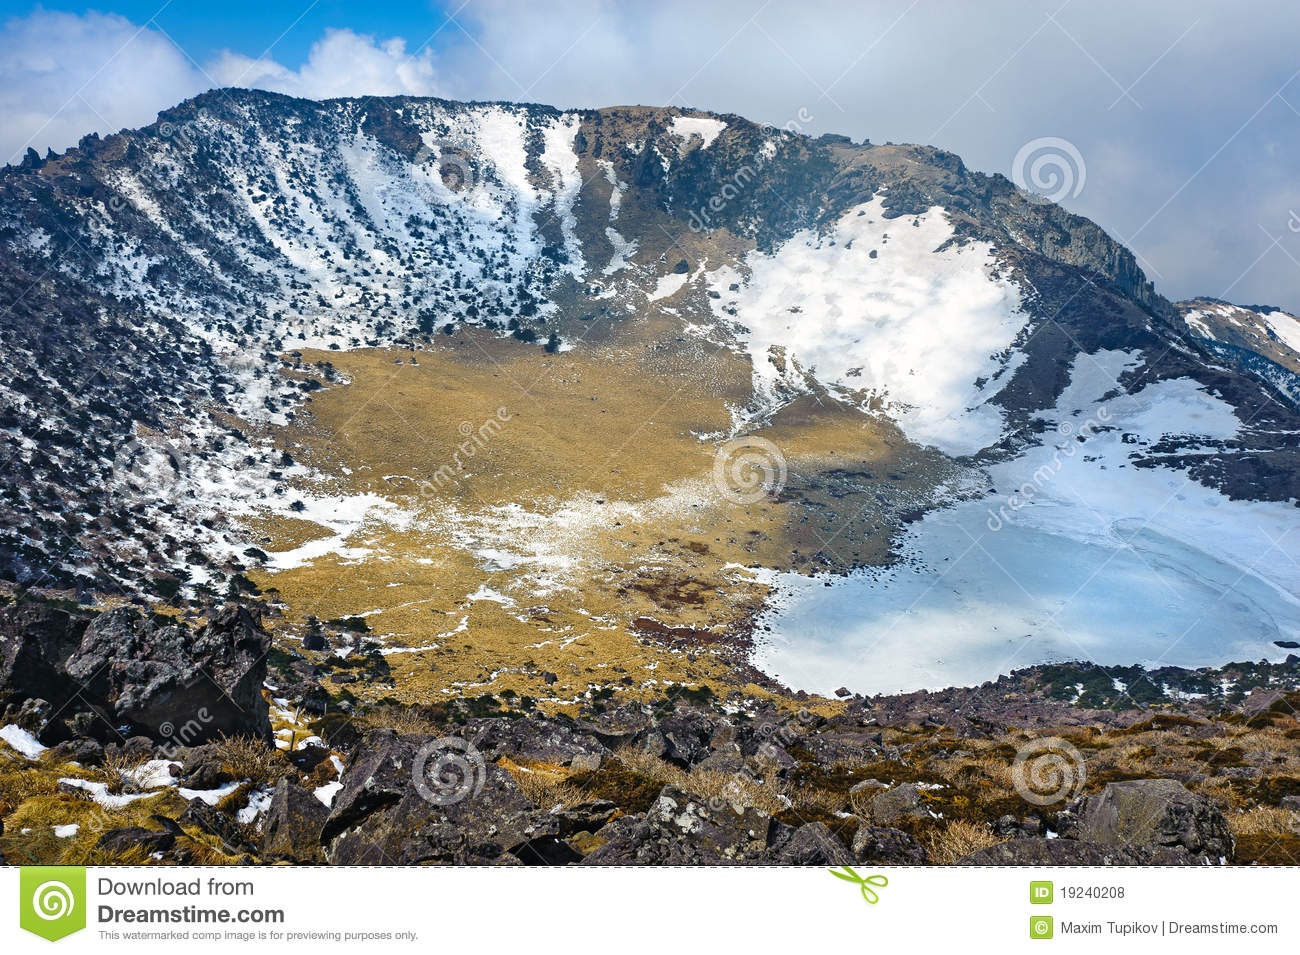 Hallasan Mountain Volcanic Crater Royalty Free Stock Photos.